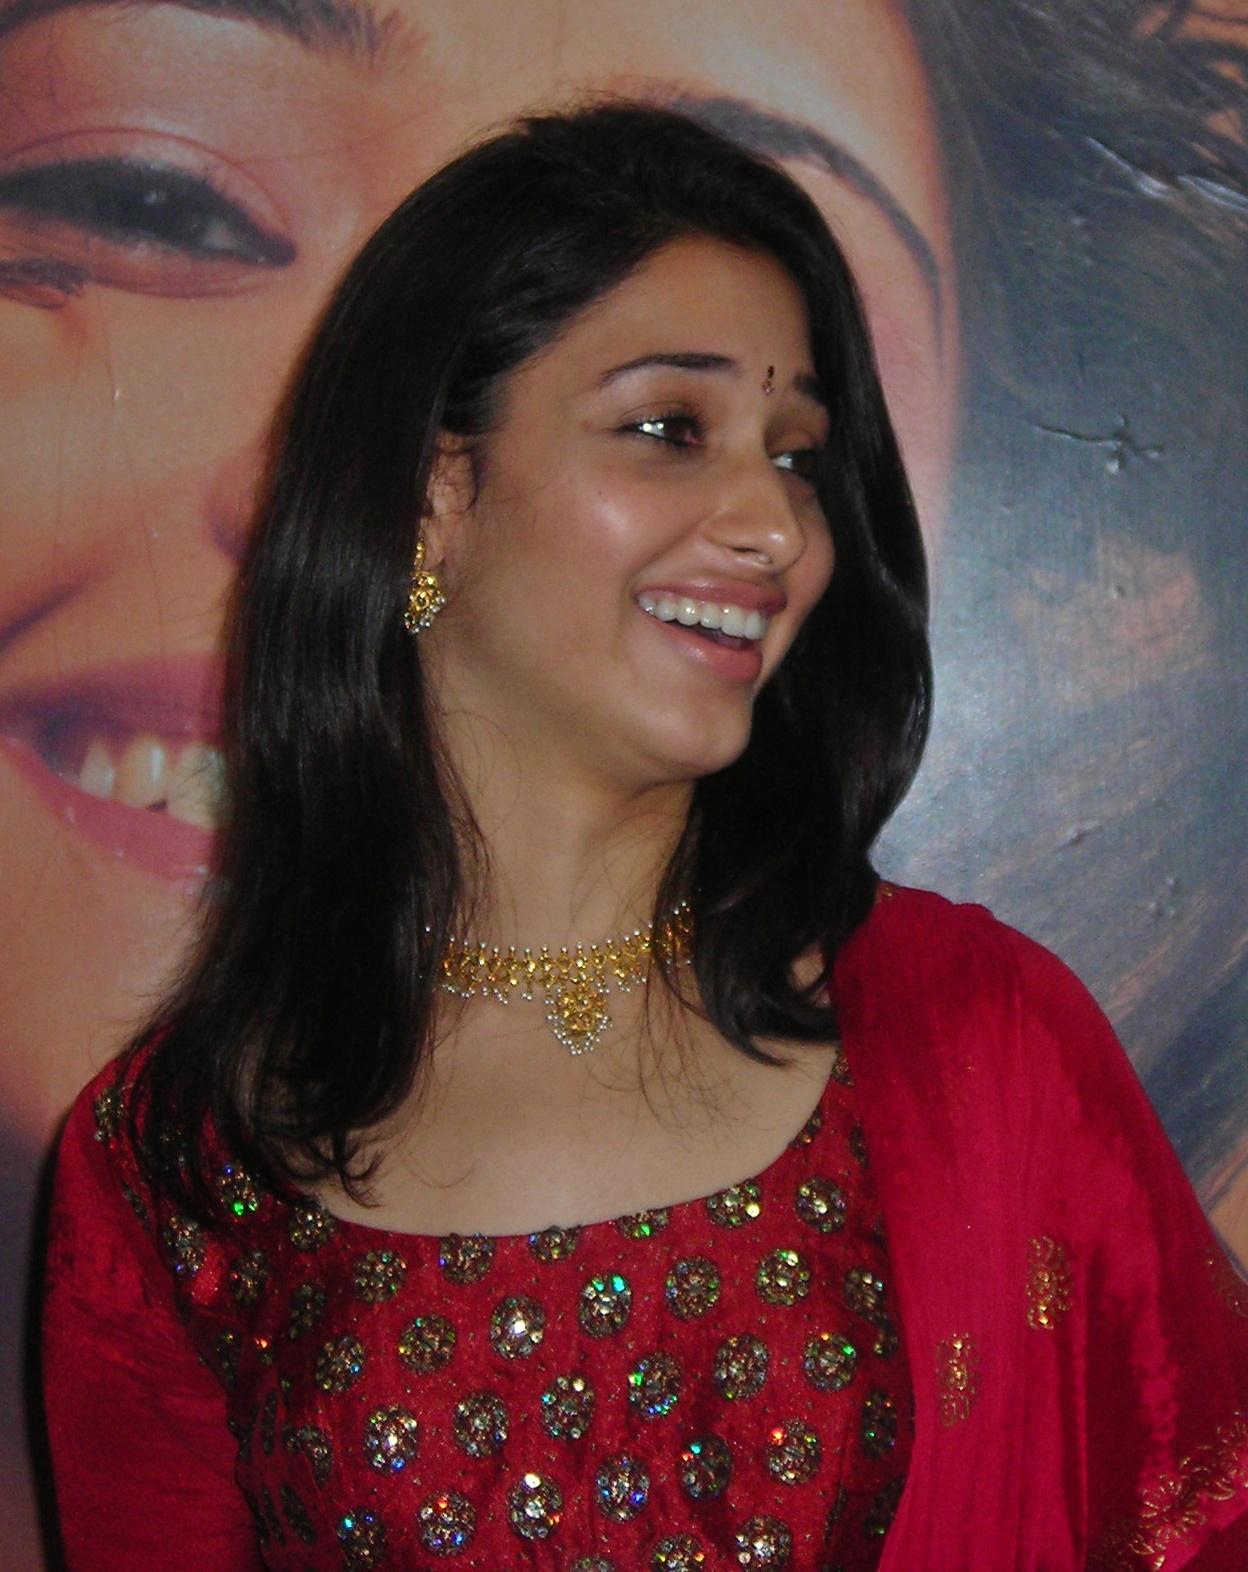 Chennai wipro tamil girl 4 - 2 part 4